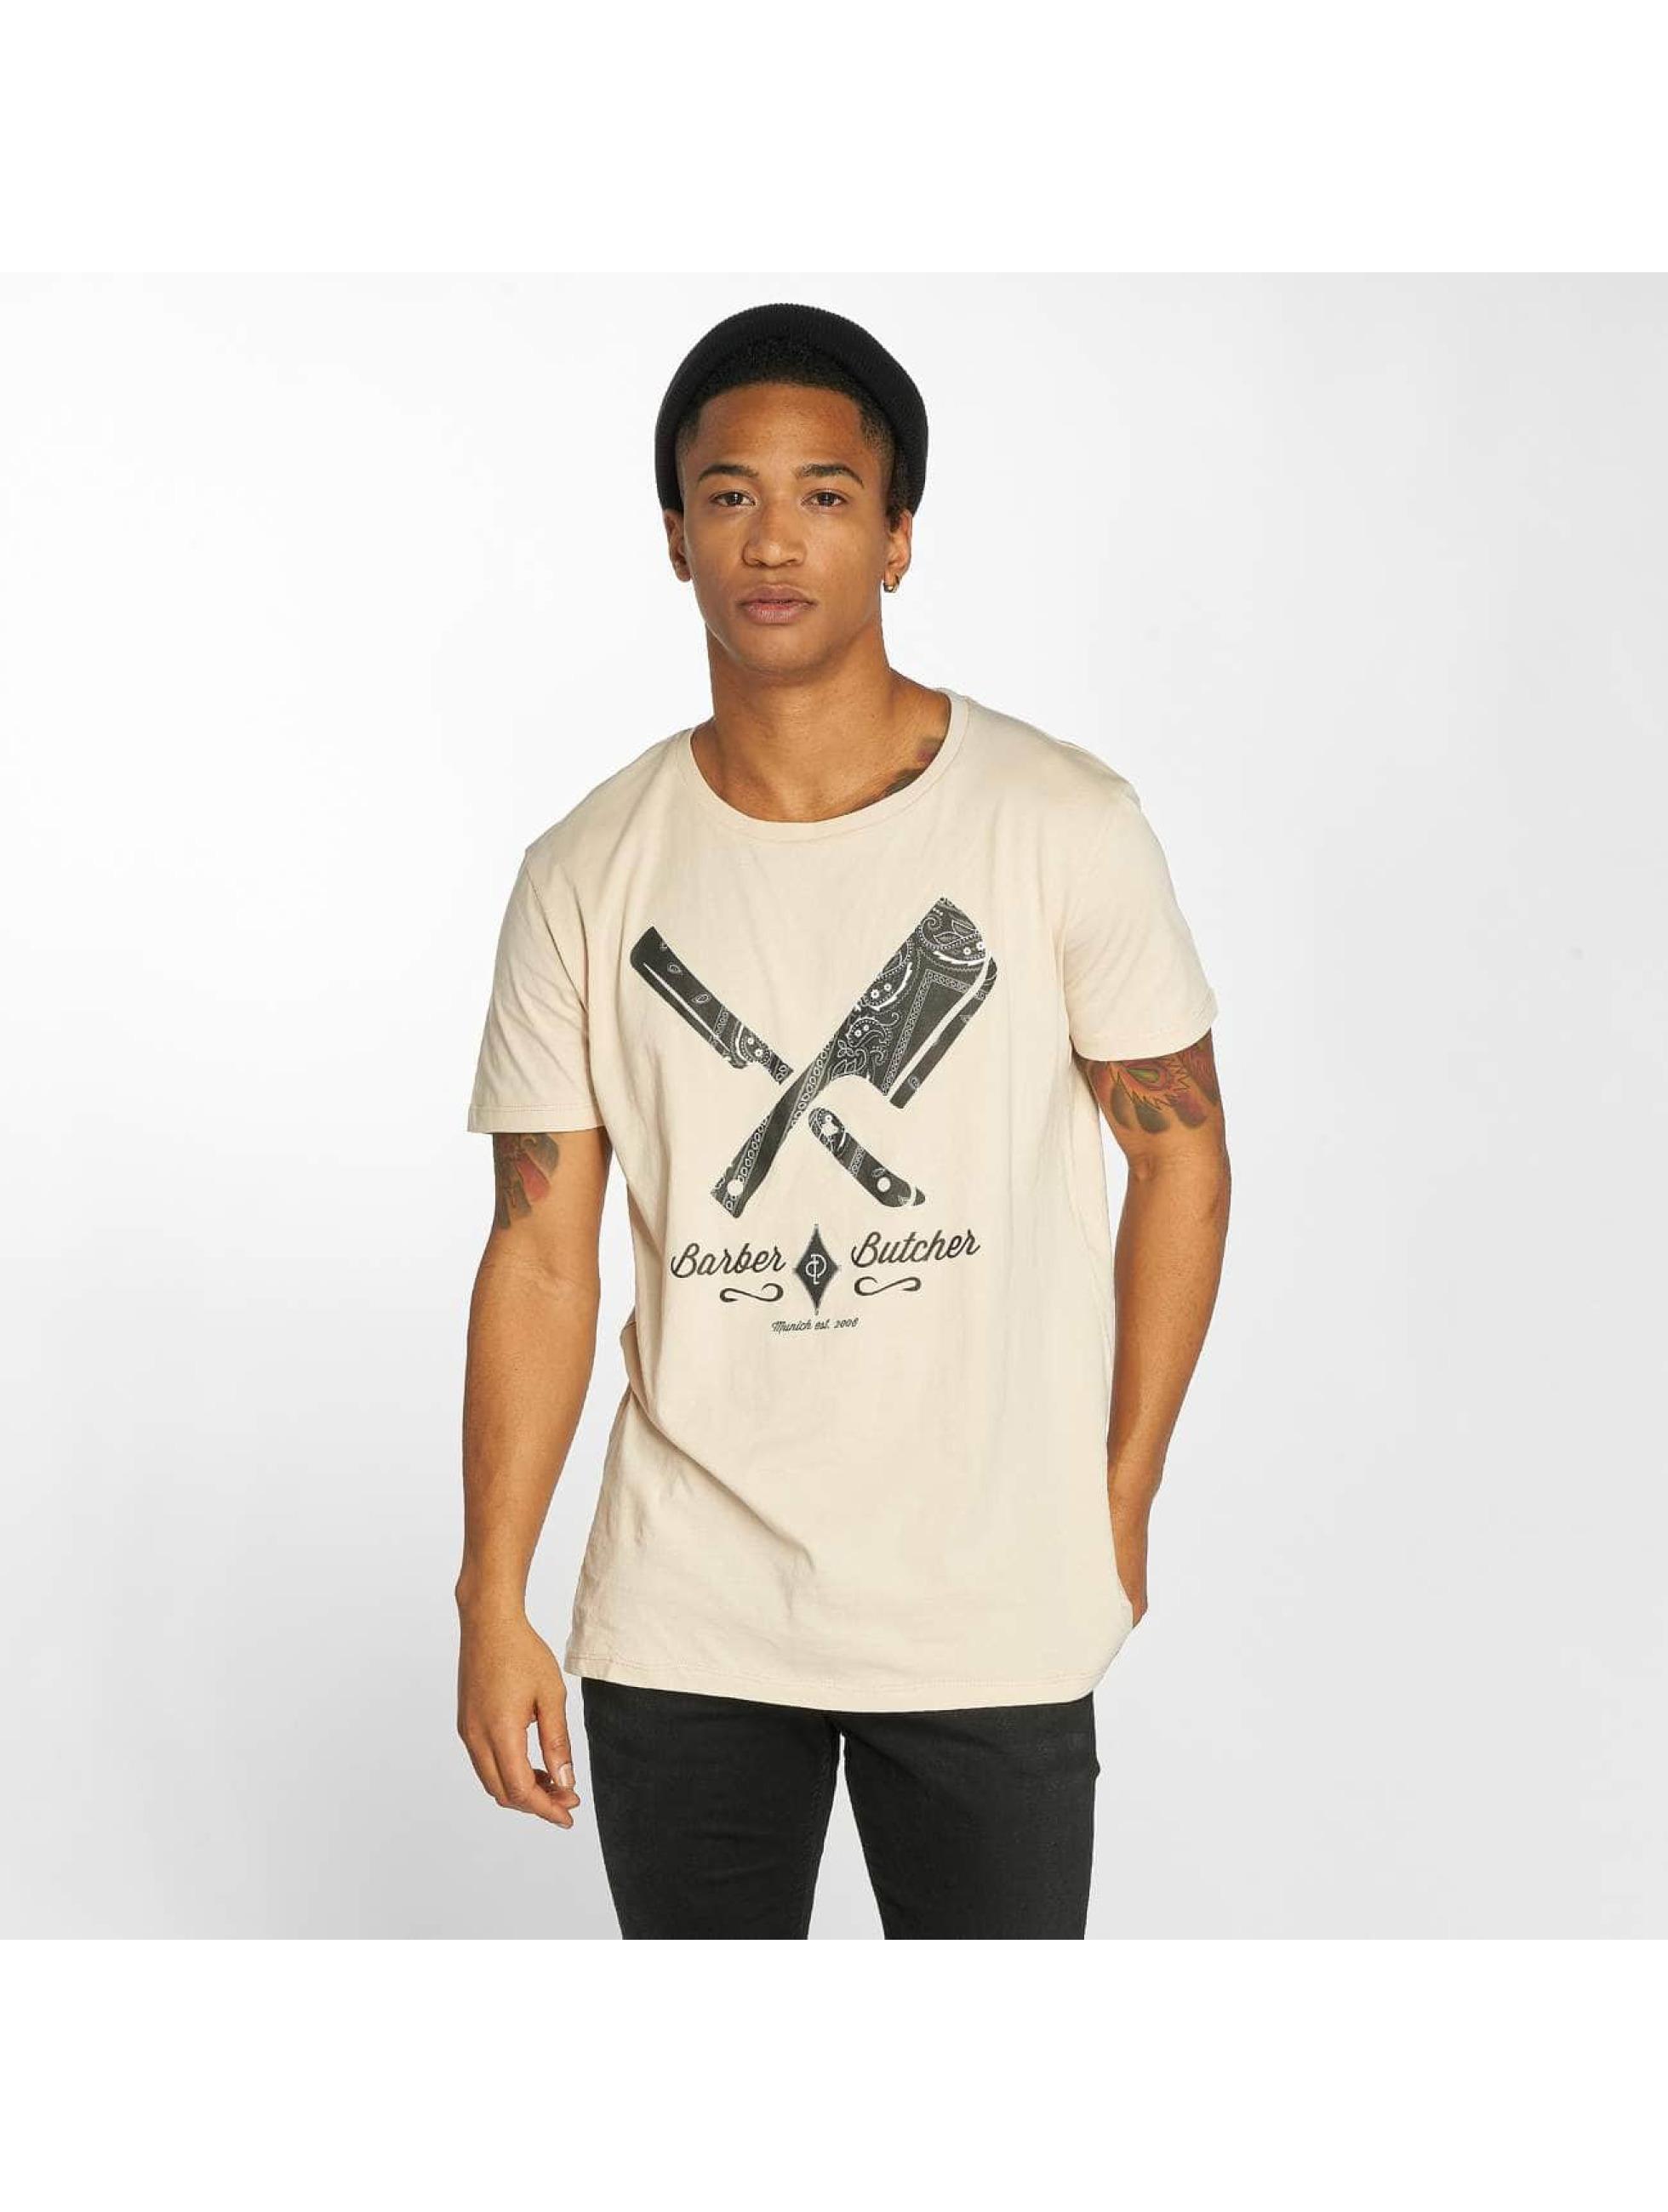 Distorted People Camiseta Barber & Butcher Paisley beis